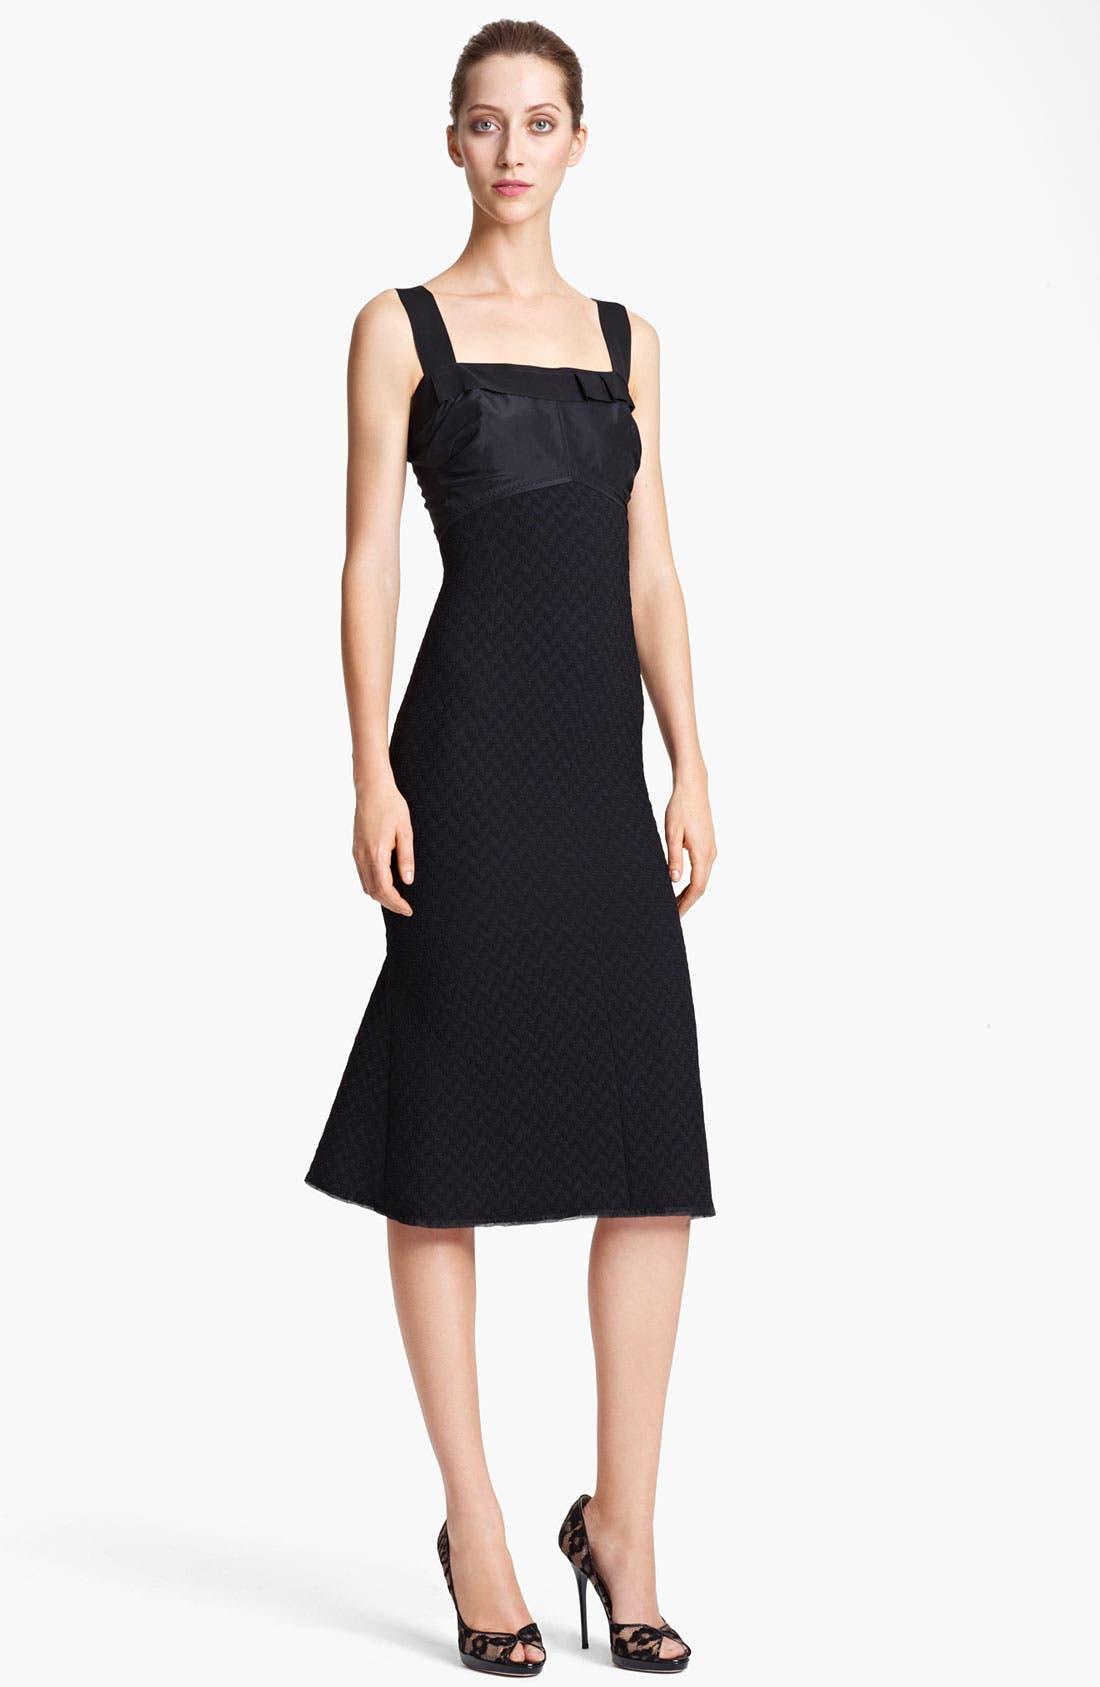 Alternate Image 1 Selected - Nina Ricci Tweed Sheath Dress